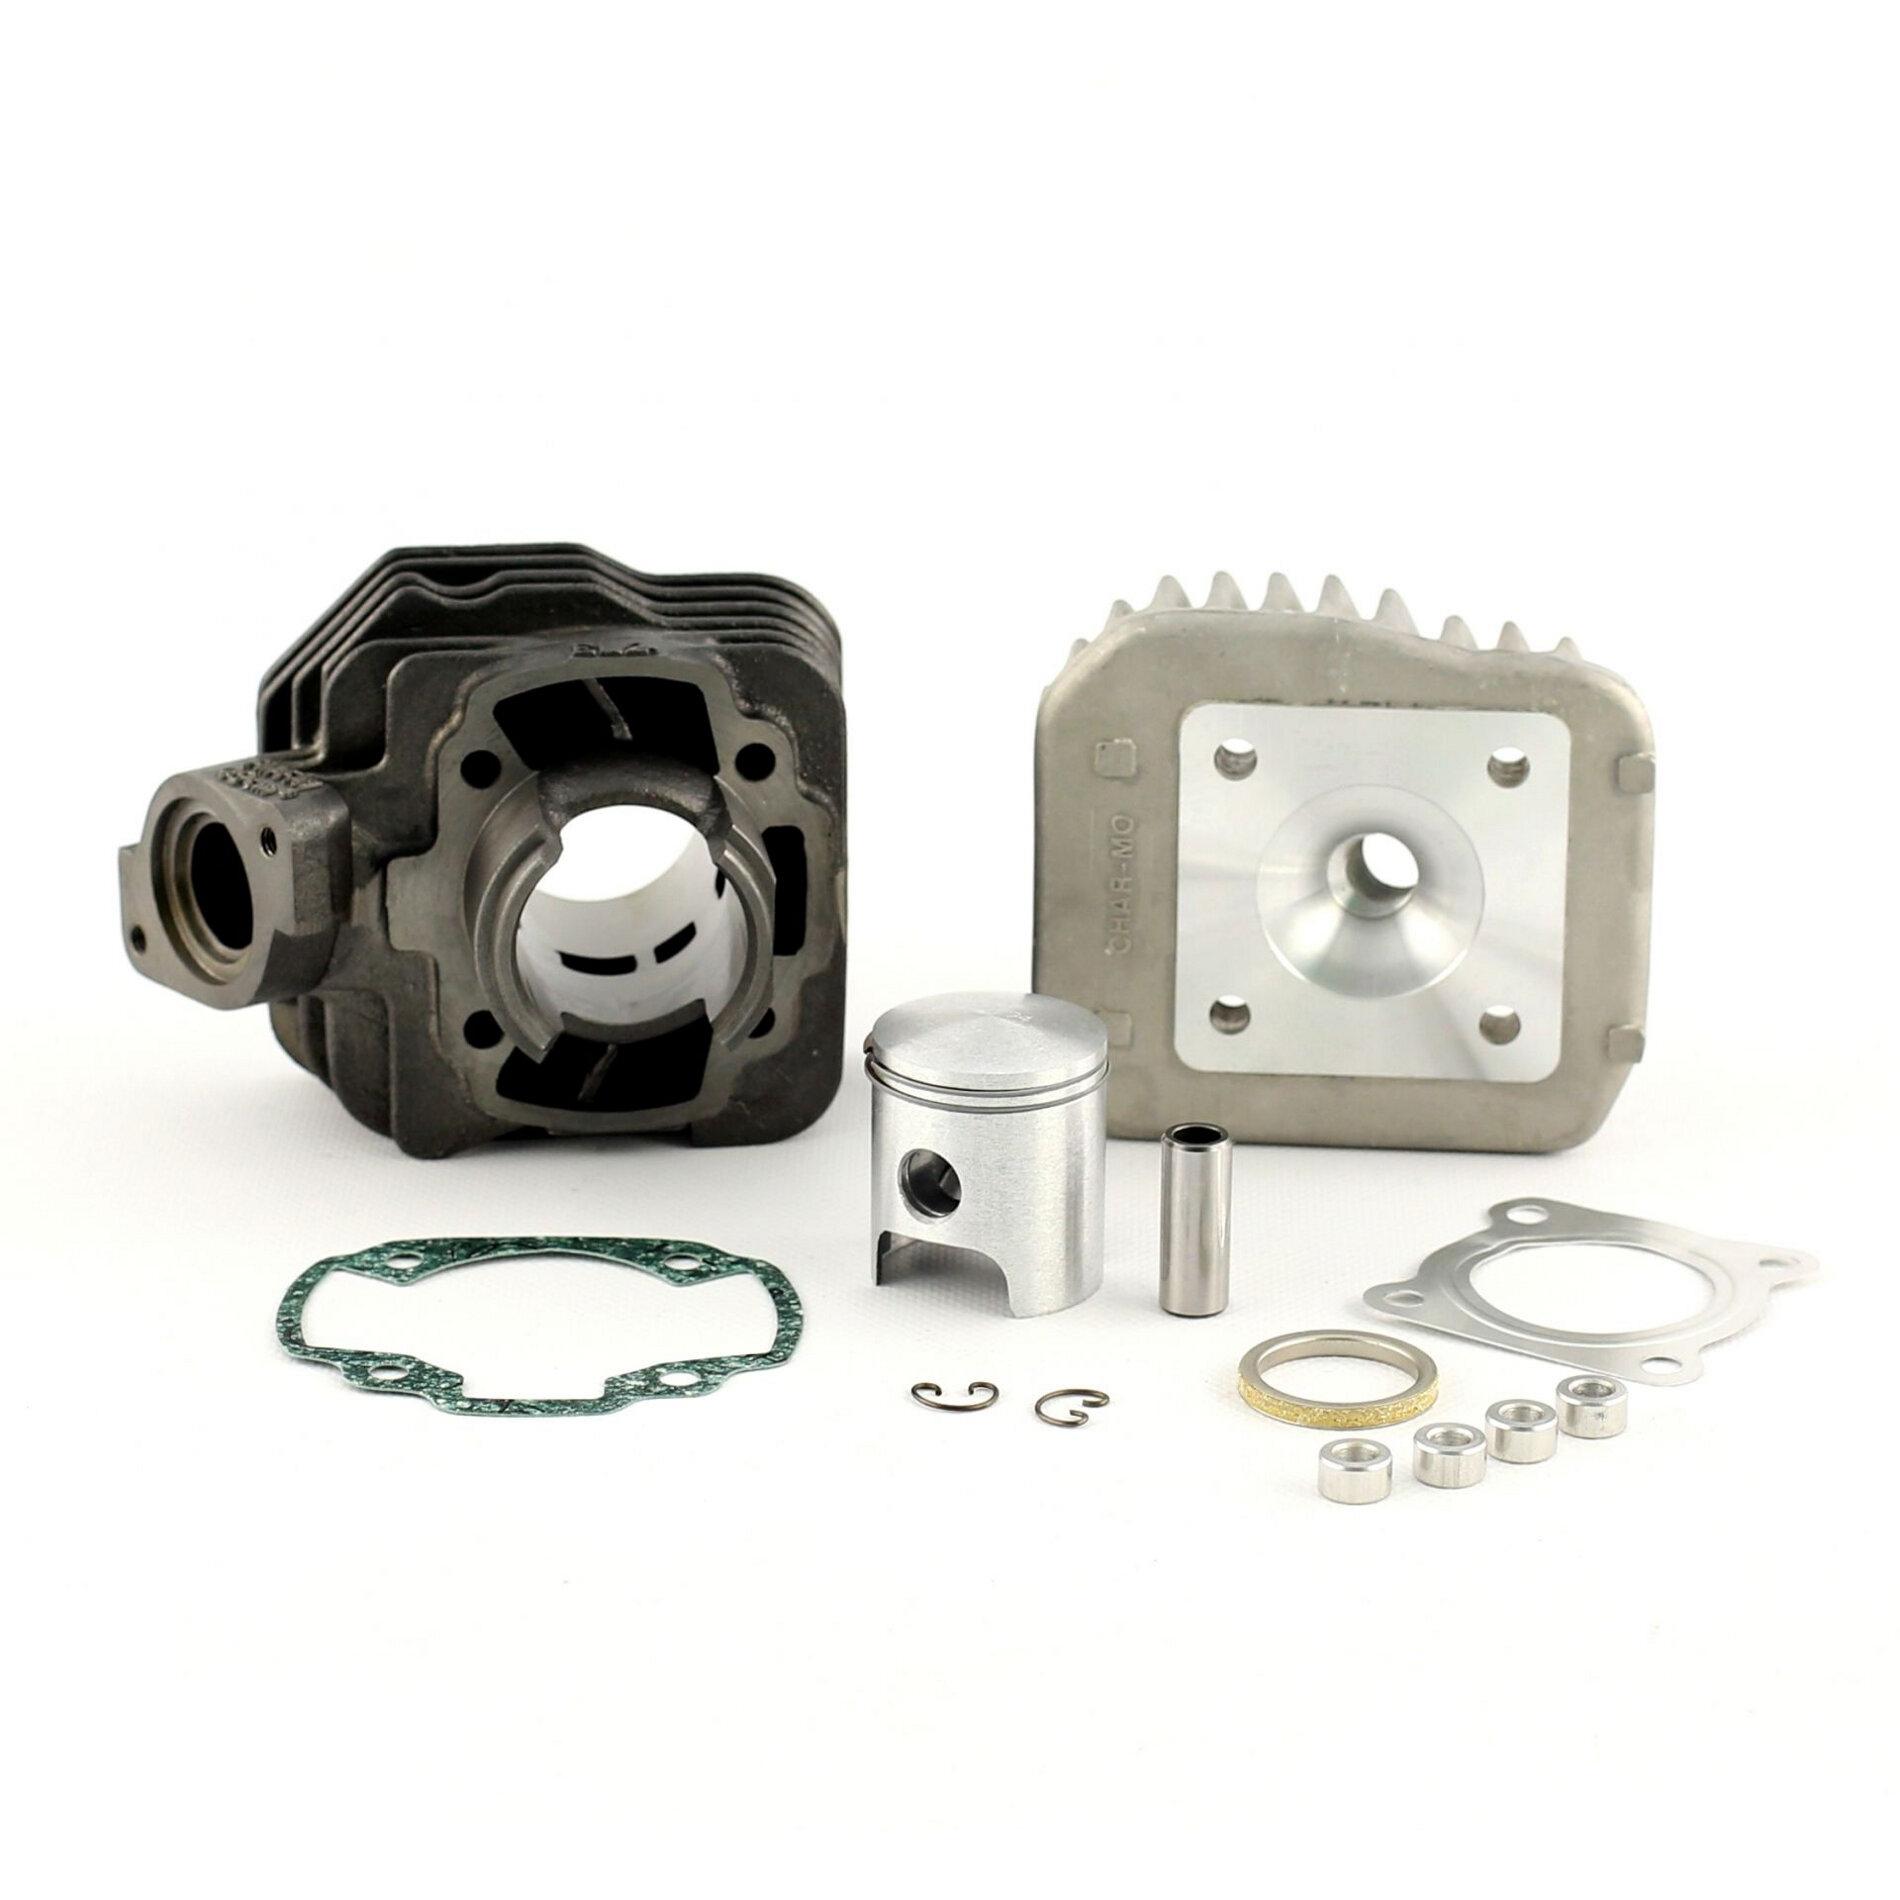 Cylindre Culasse D.40 Barikit Fonte Peugeot Trekker/Speedfight 2 AC 50